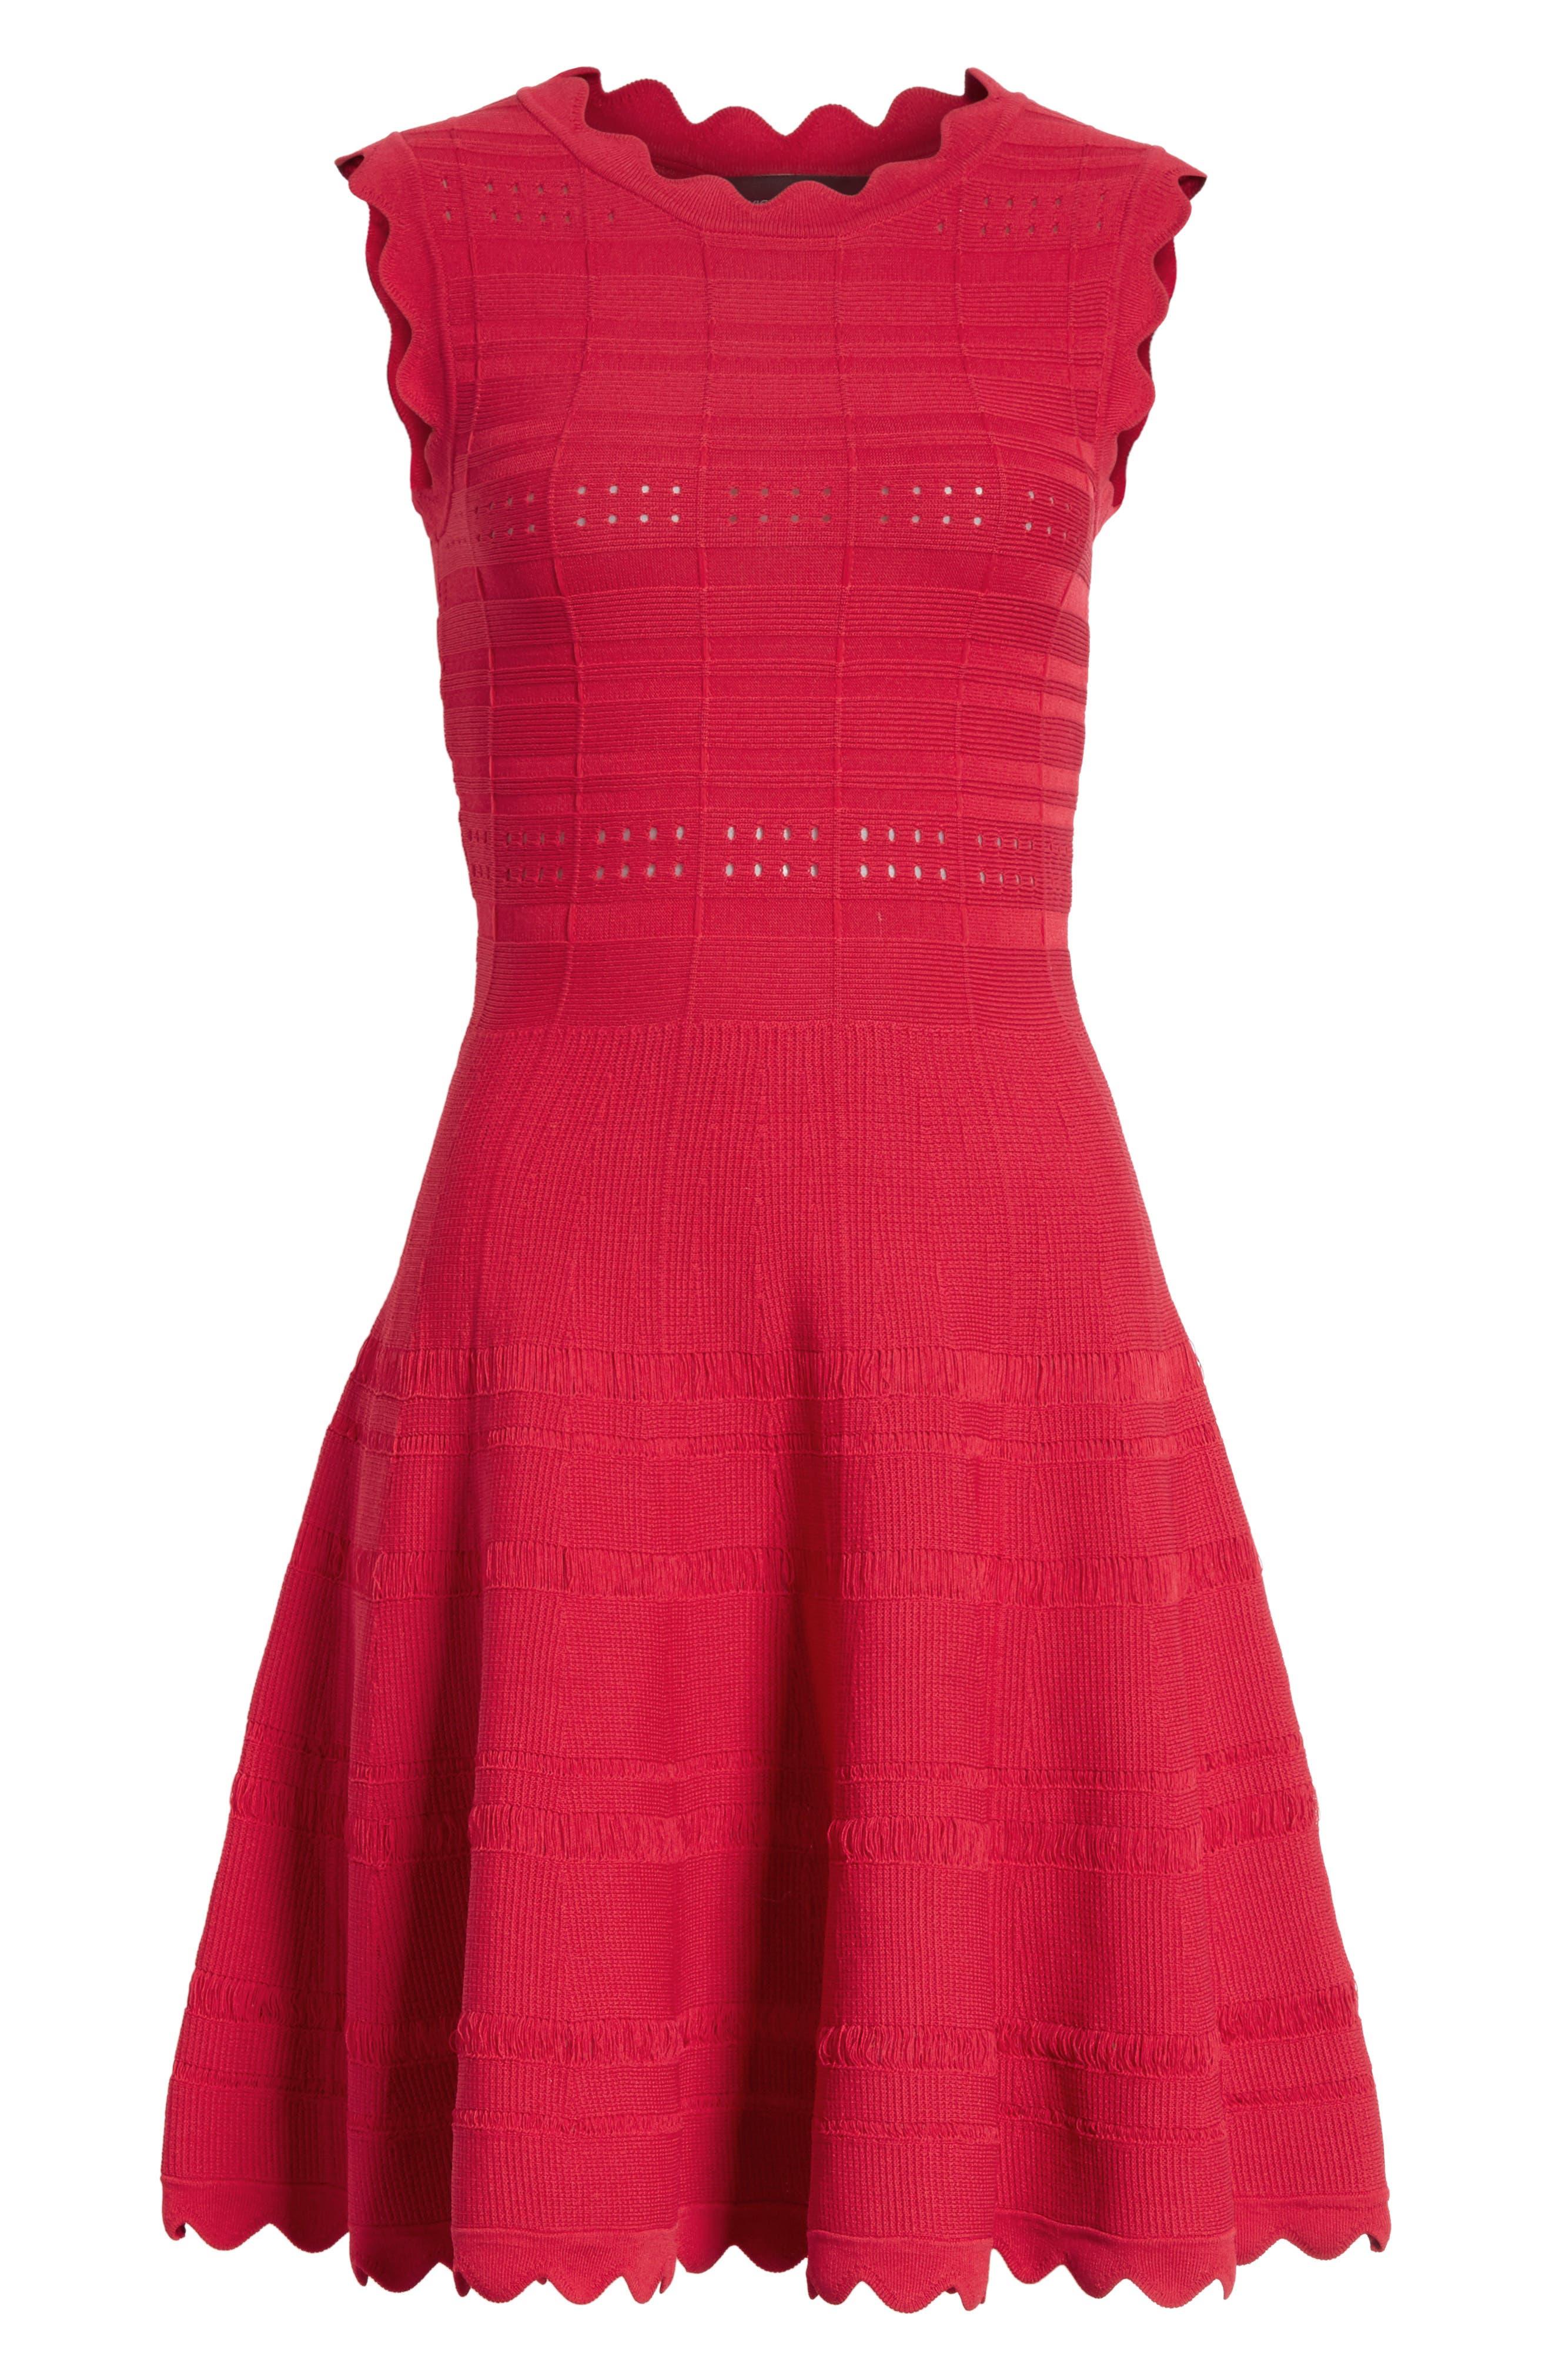 Scallop Trim Knit Dress,                             Alternate thumbnail 7, color,